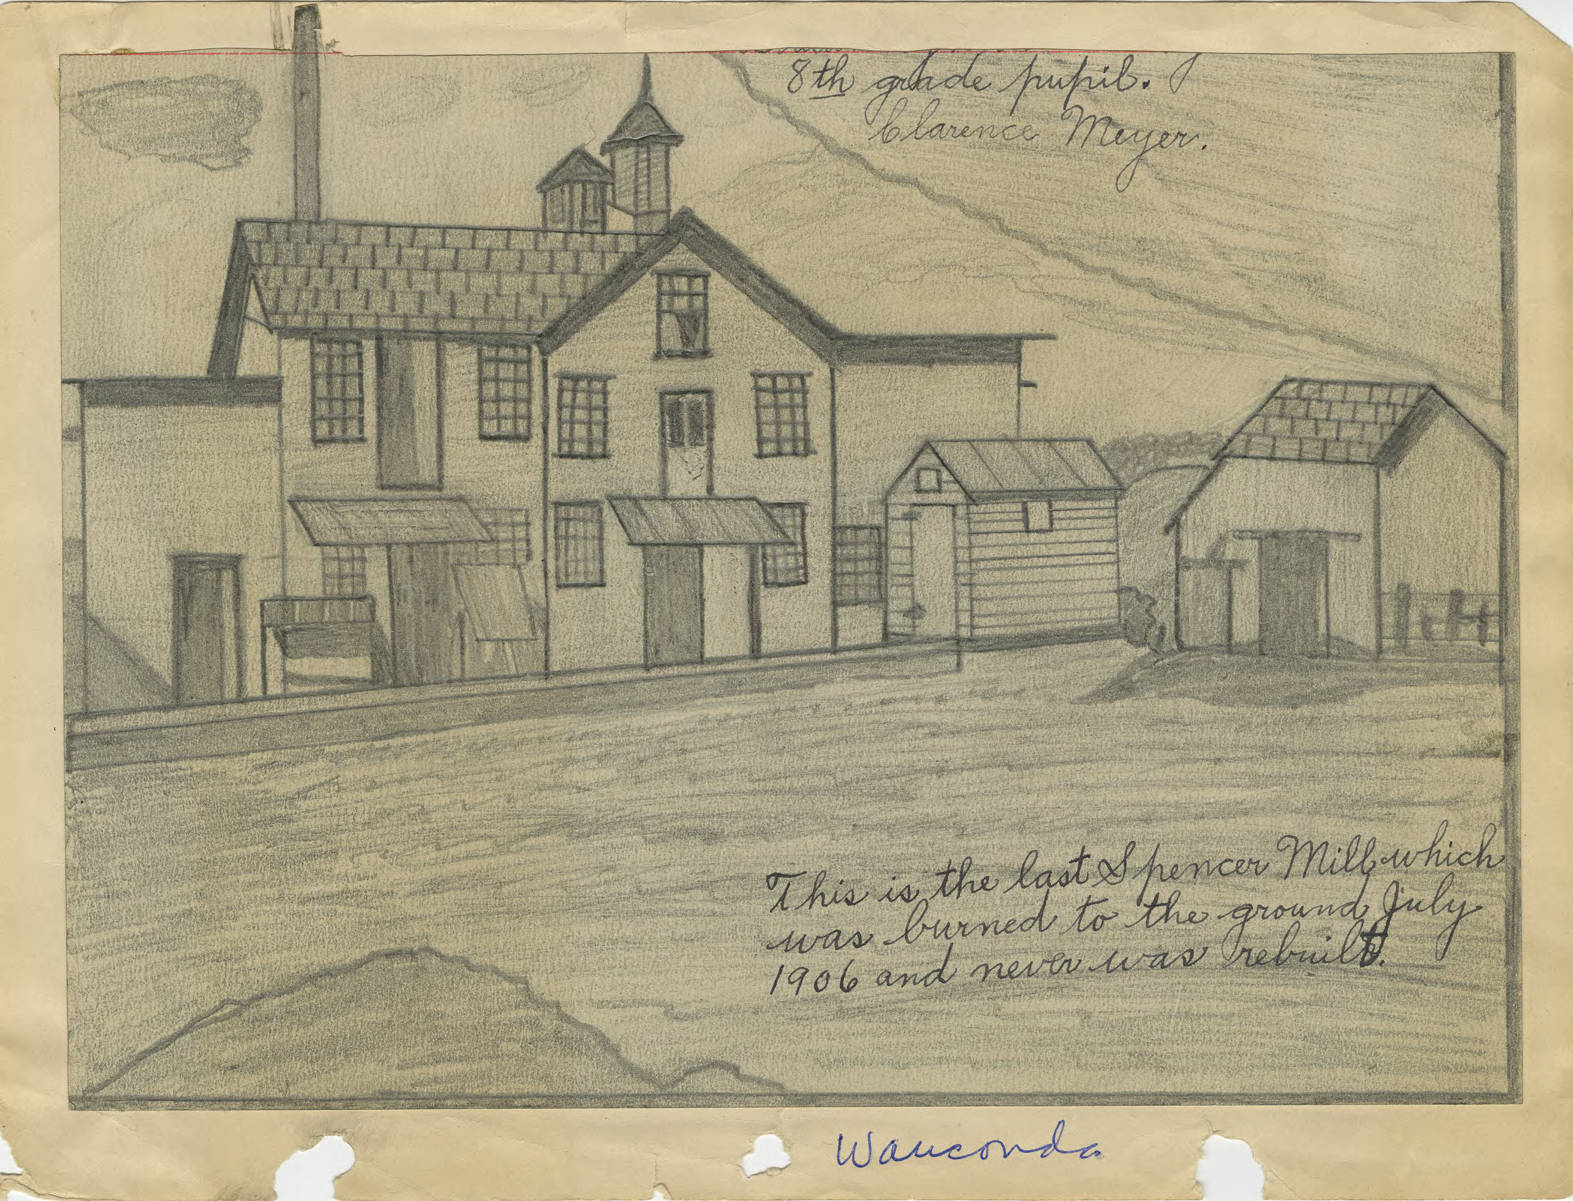 C:\Users\Vern\Documents\Fort Hill\1918 Schools Centennial\1918 Wauconda Twp Wauconda School\1918_School_Histories__Wauconda_Township__Wauconda_School_2003046_Page_50.jpg